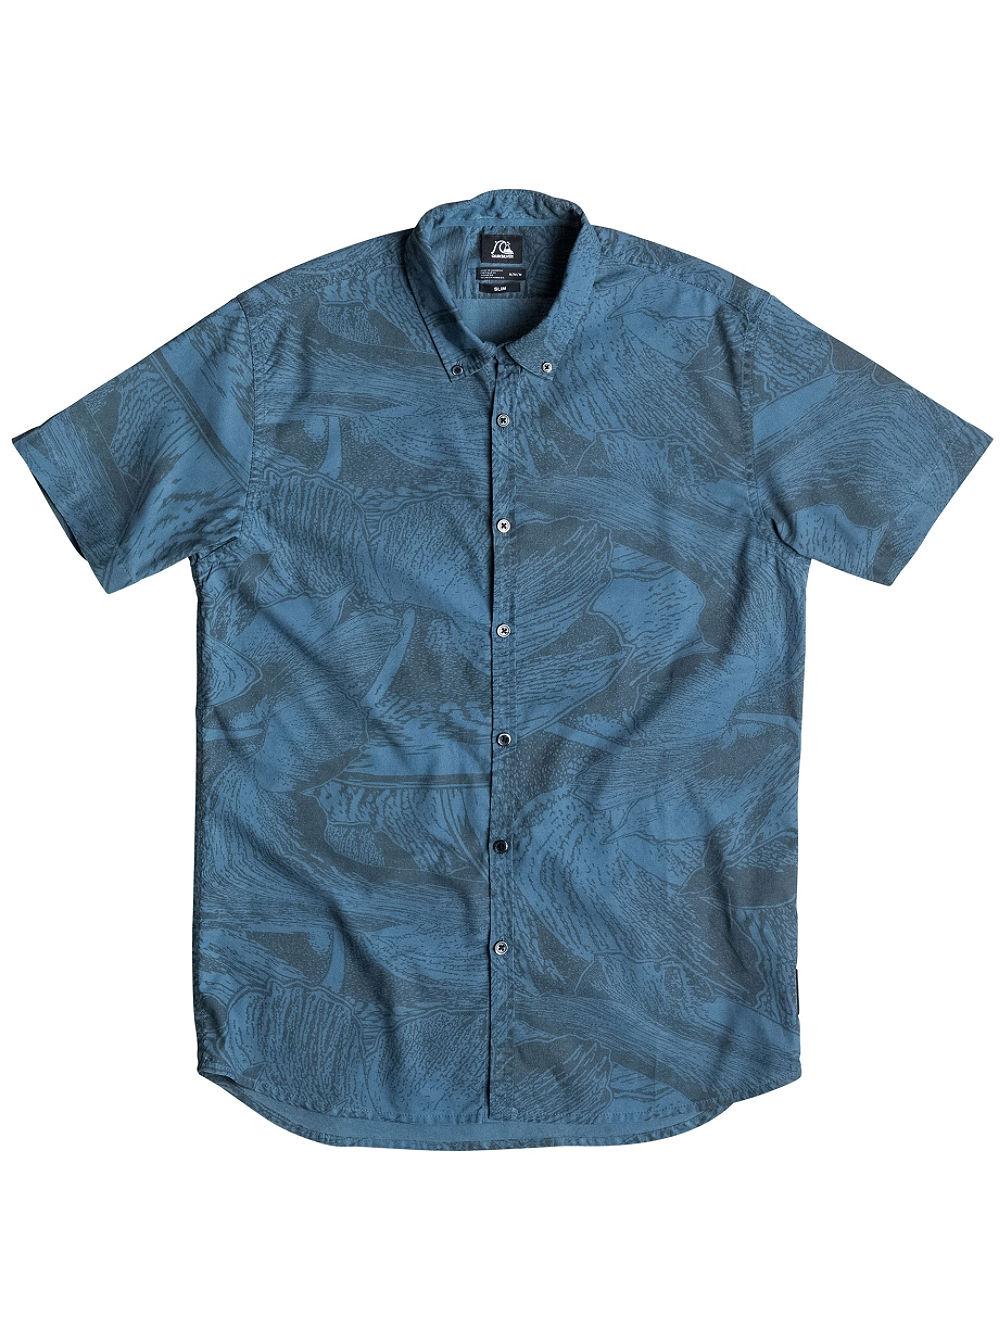 quiksilver-dark-trip-shirt